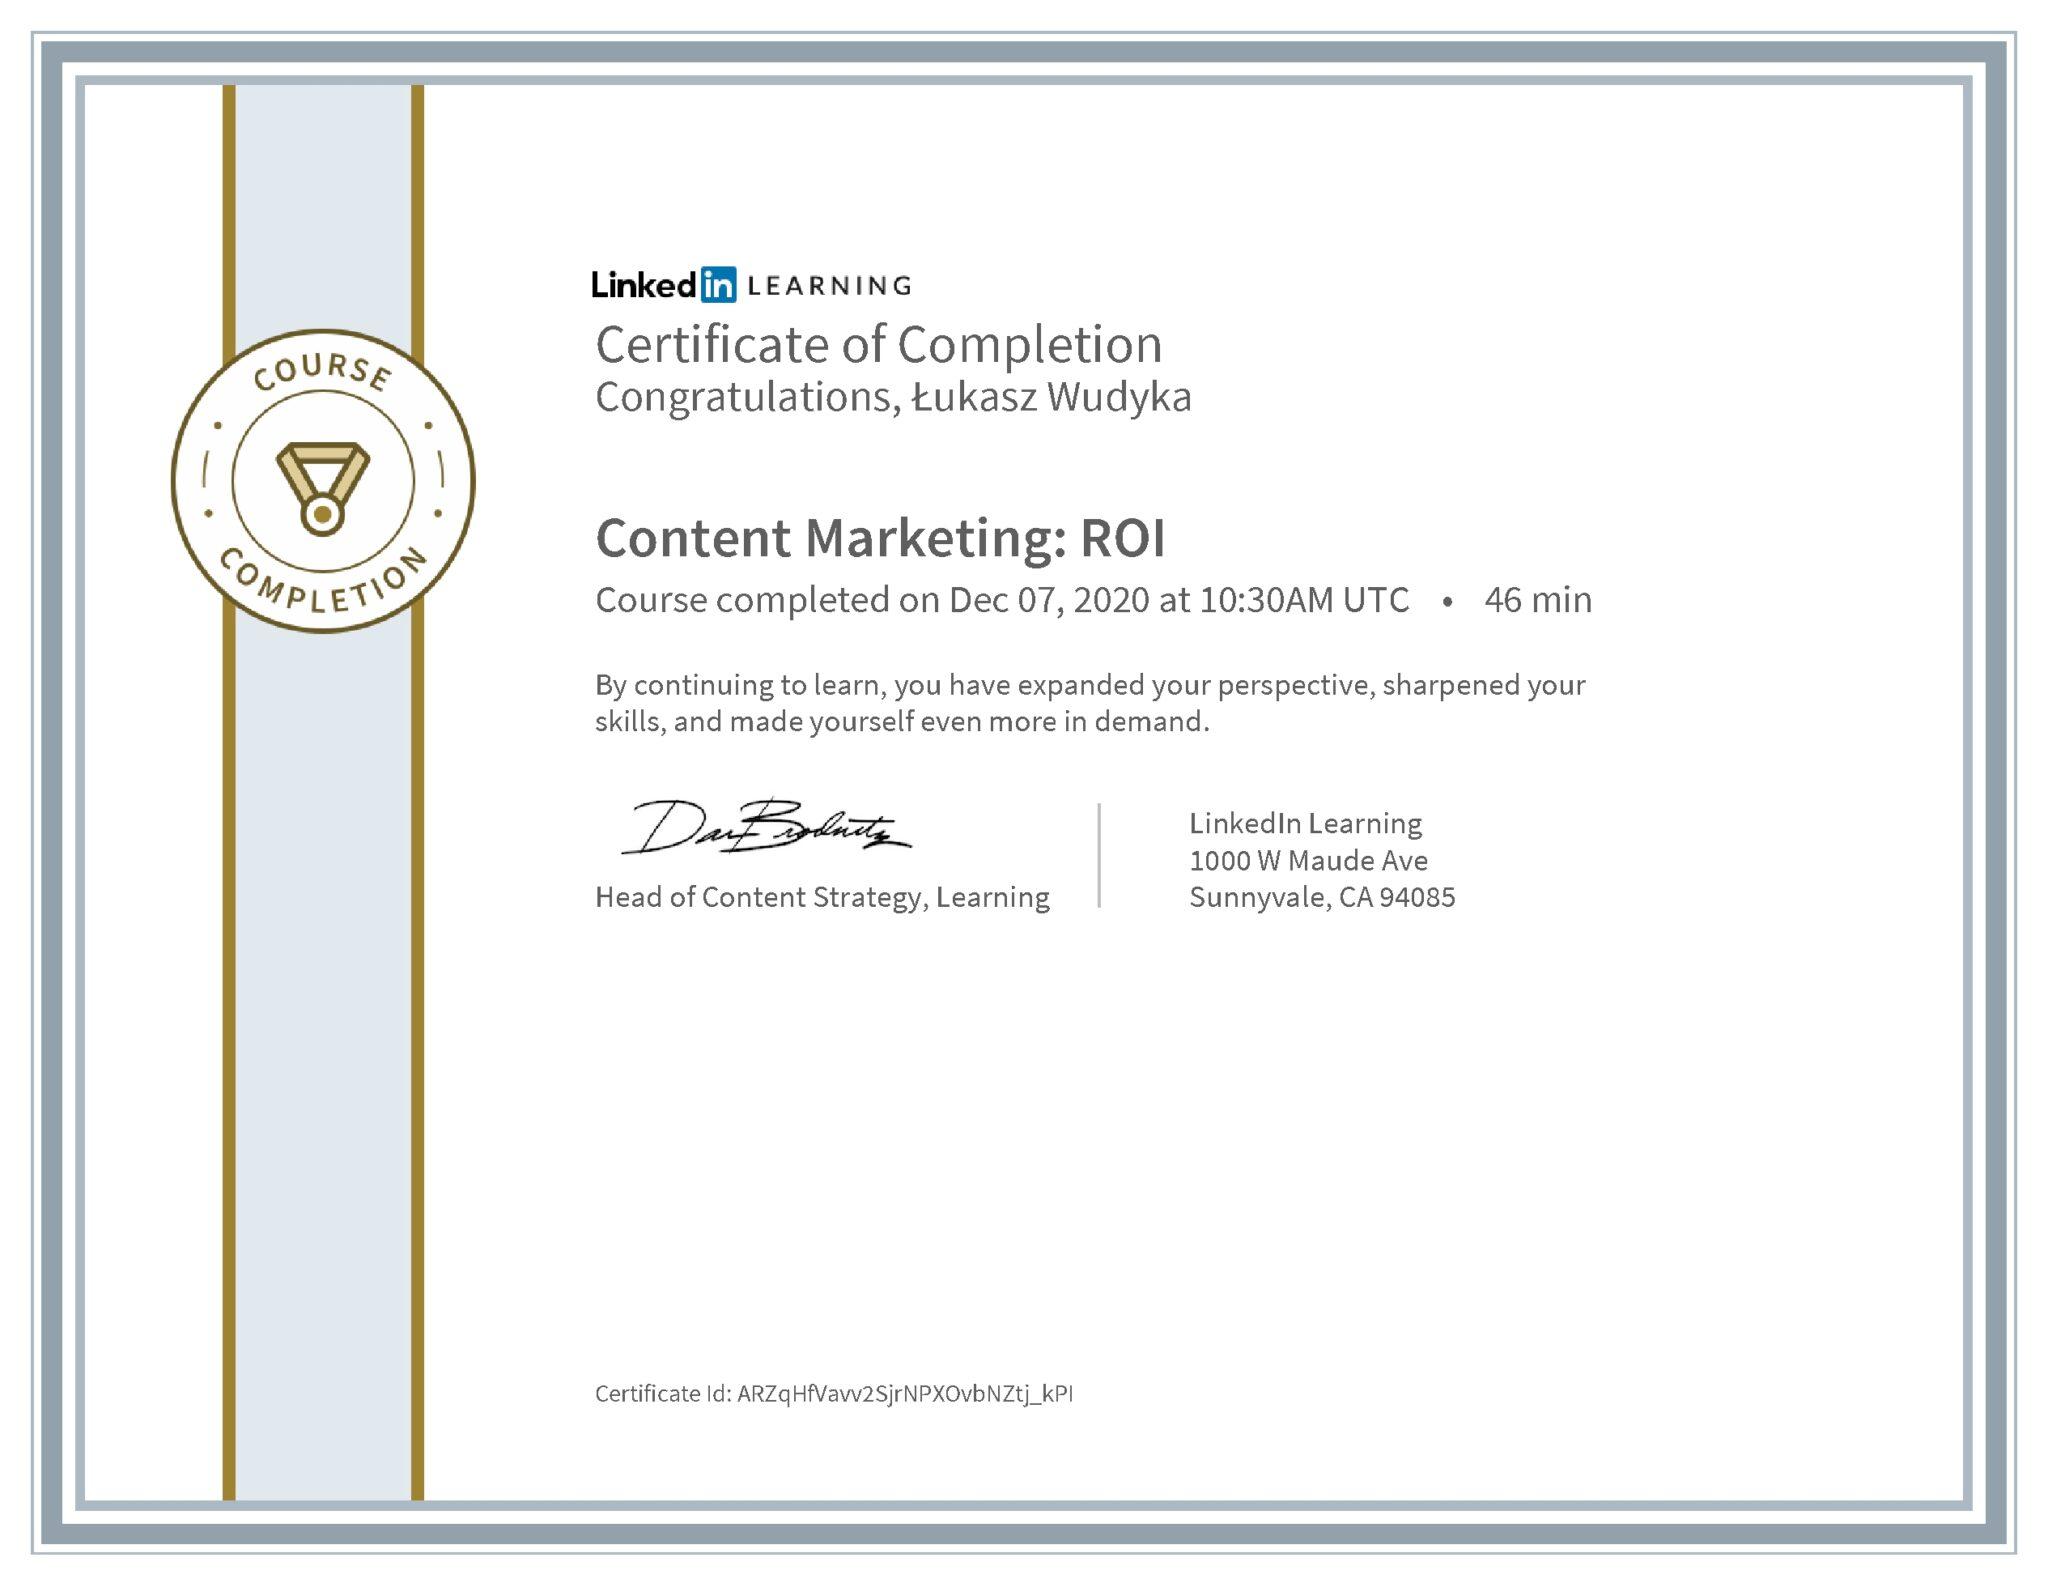 Łukasz Wudyka certyfikat LinkedIn Content Marketing: ROI